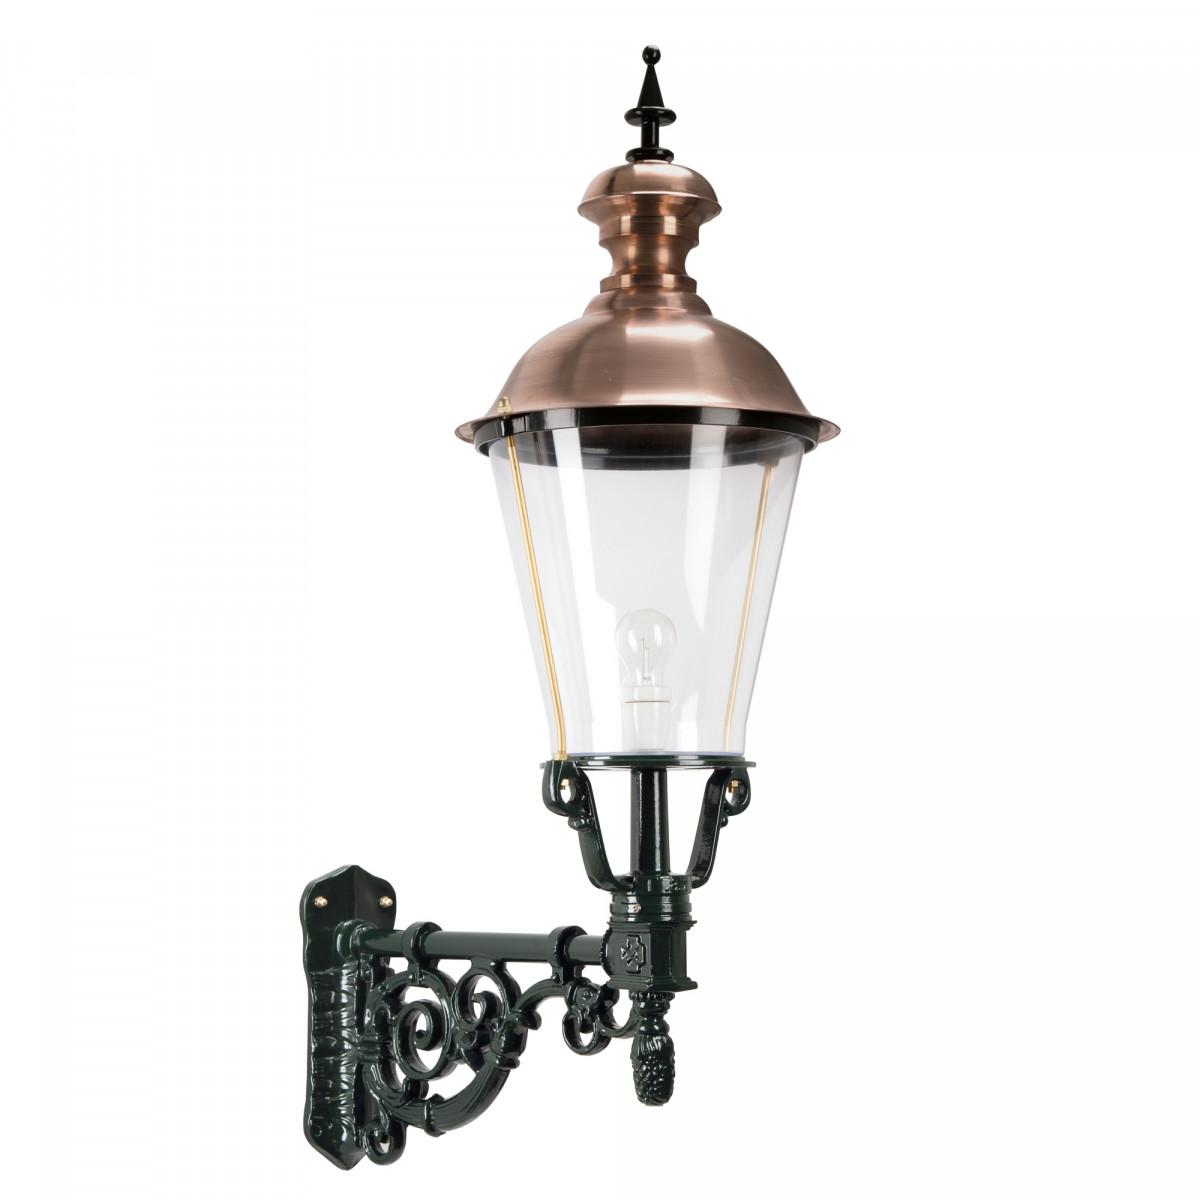 Buitenlamp Amsterdam (1215) - KS Verlichting - Buitenverlichting Rond